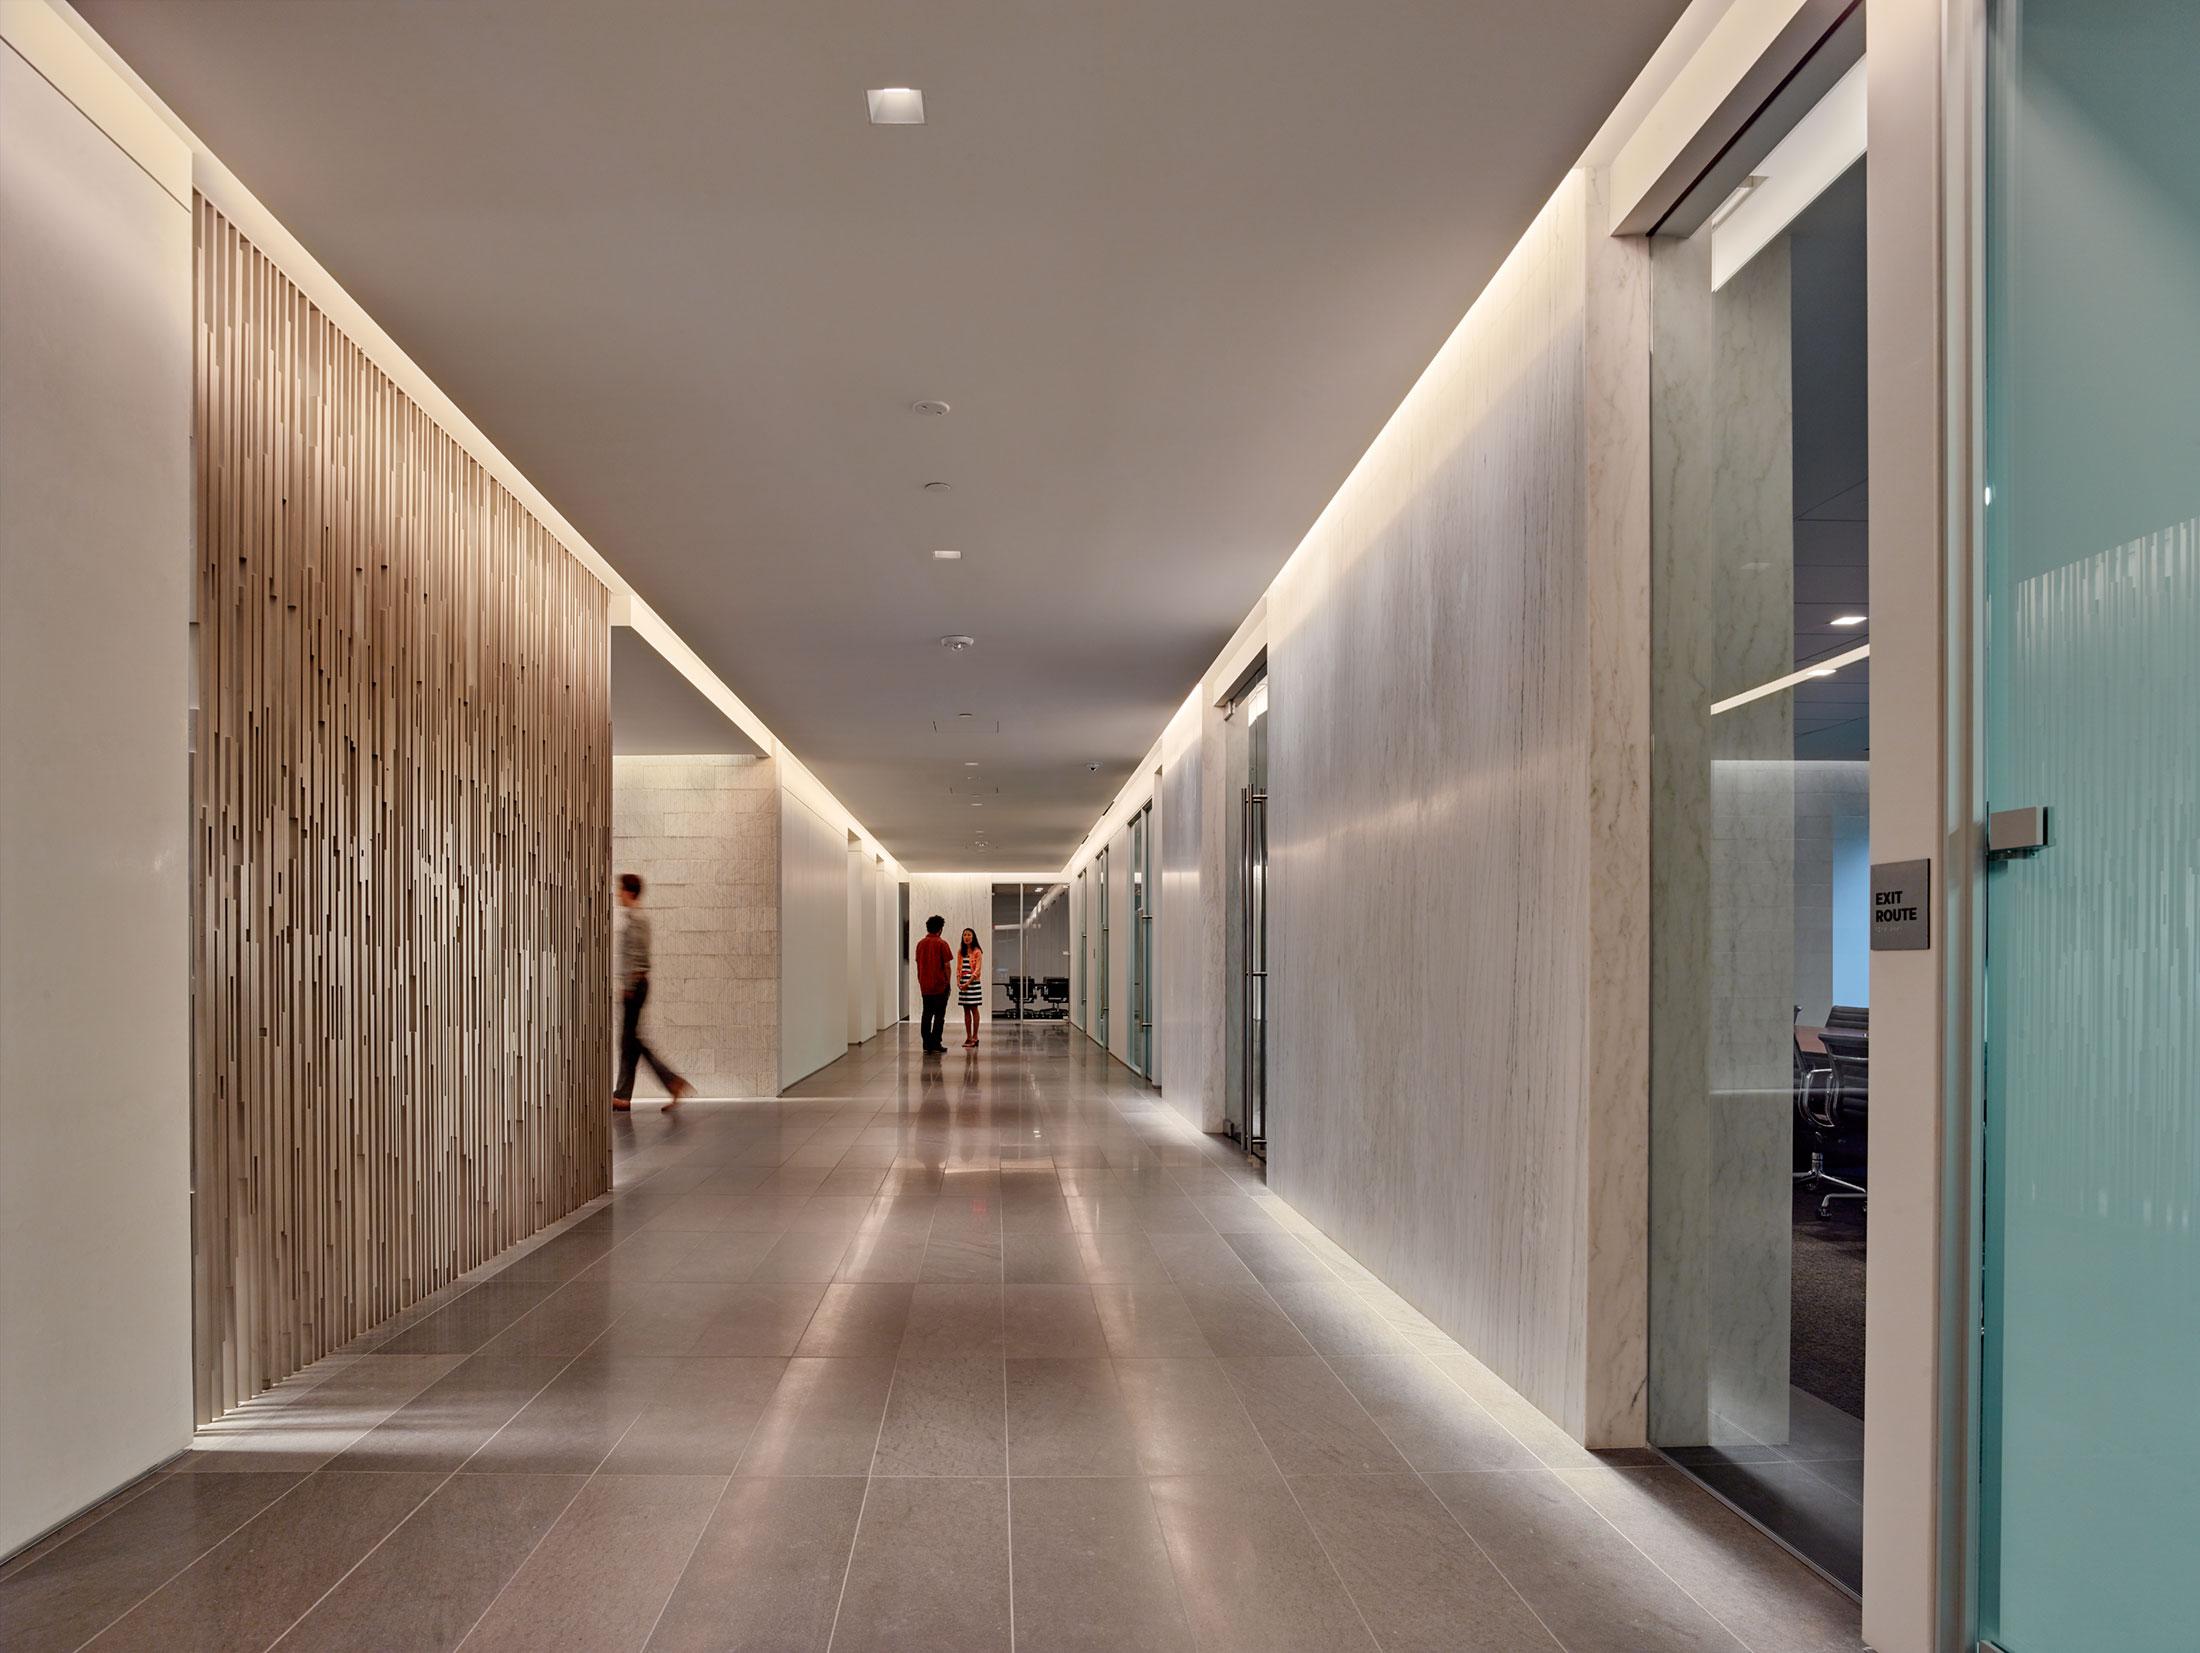 modern-architecture-commercial-interiors-workplace-office-custom-fabrication-california-shubindonaldson-cim-headquarters-08